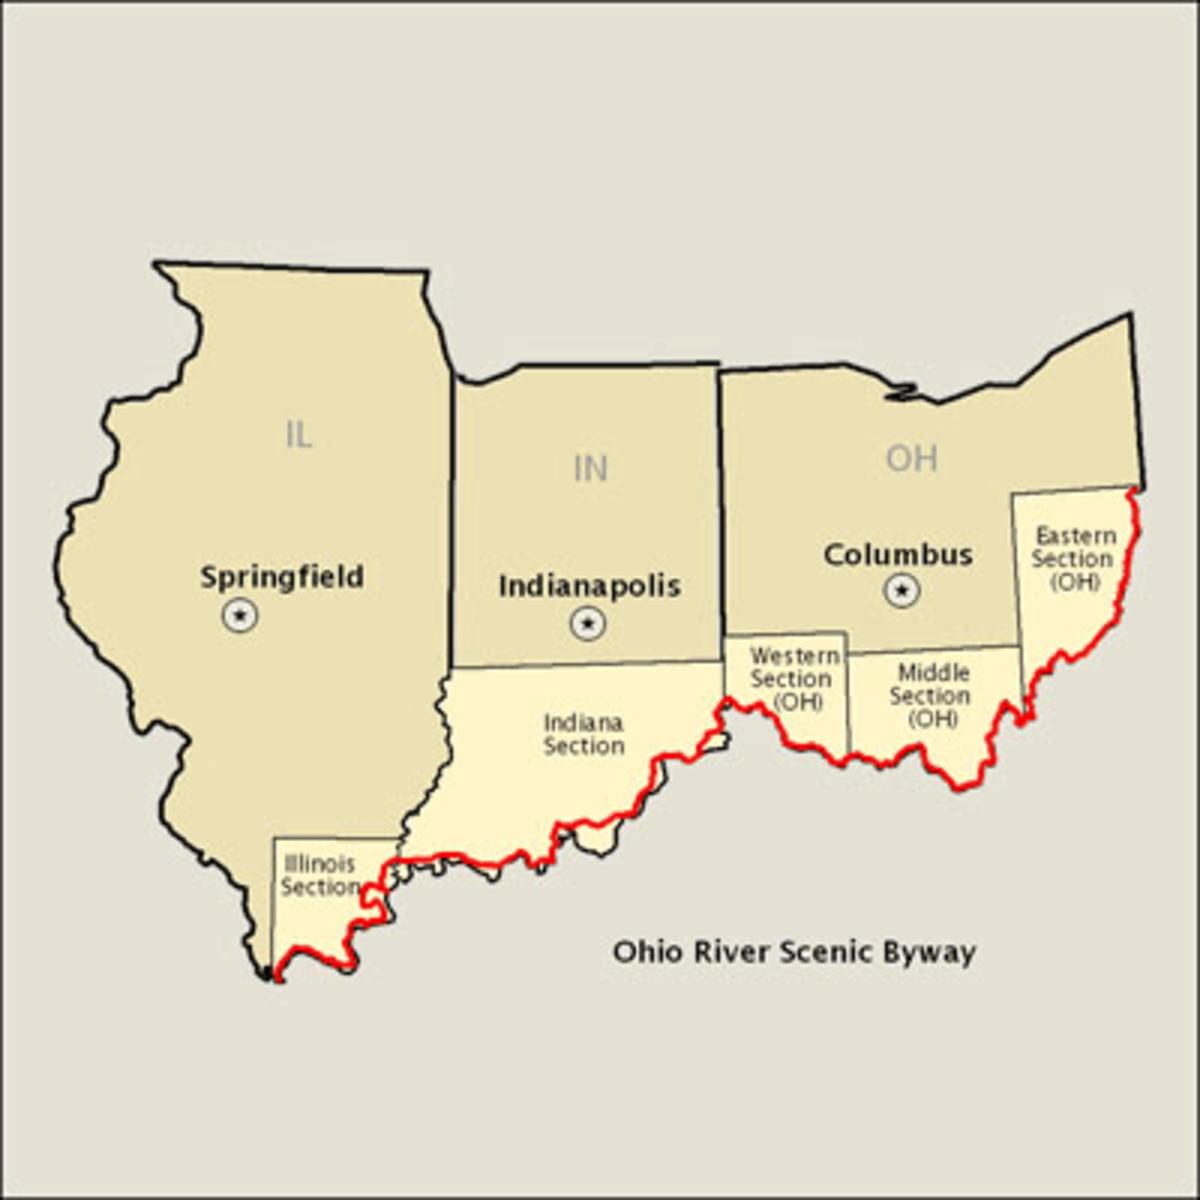 Ohio River Scenic Byway: Illinois, Indiana, Ohio